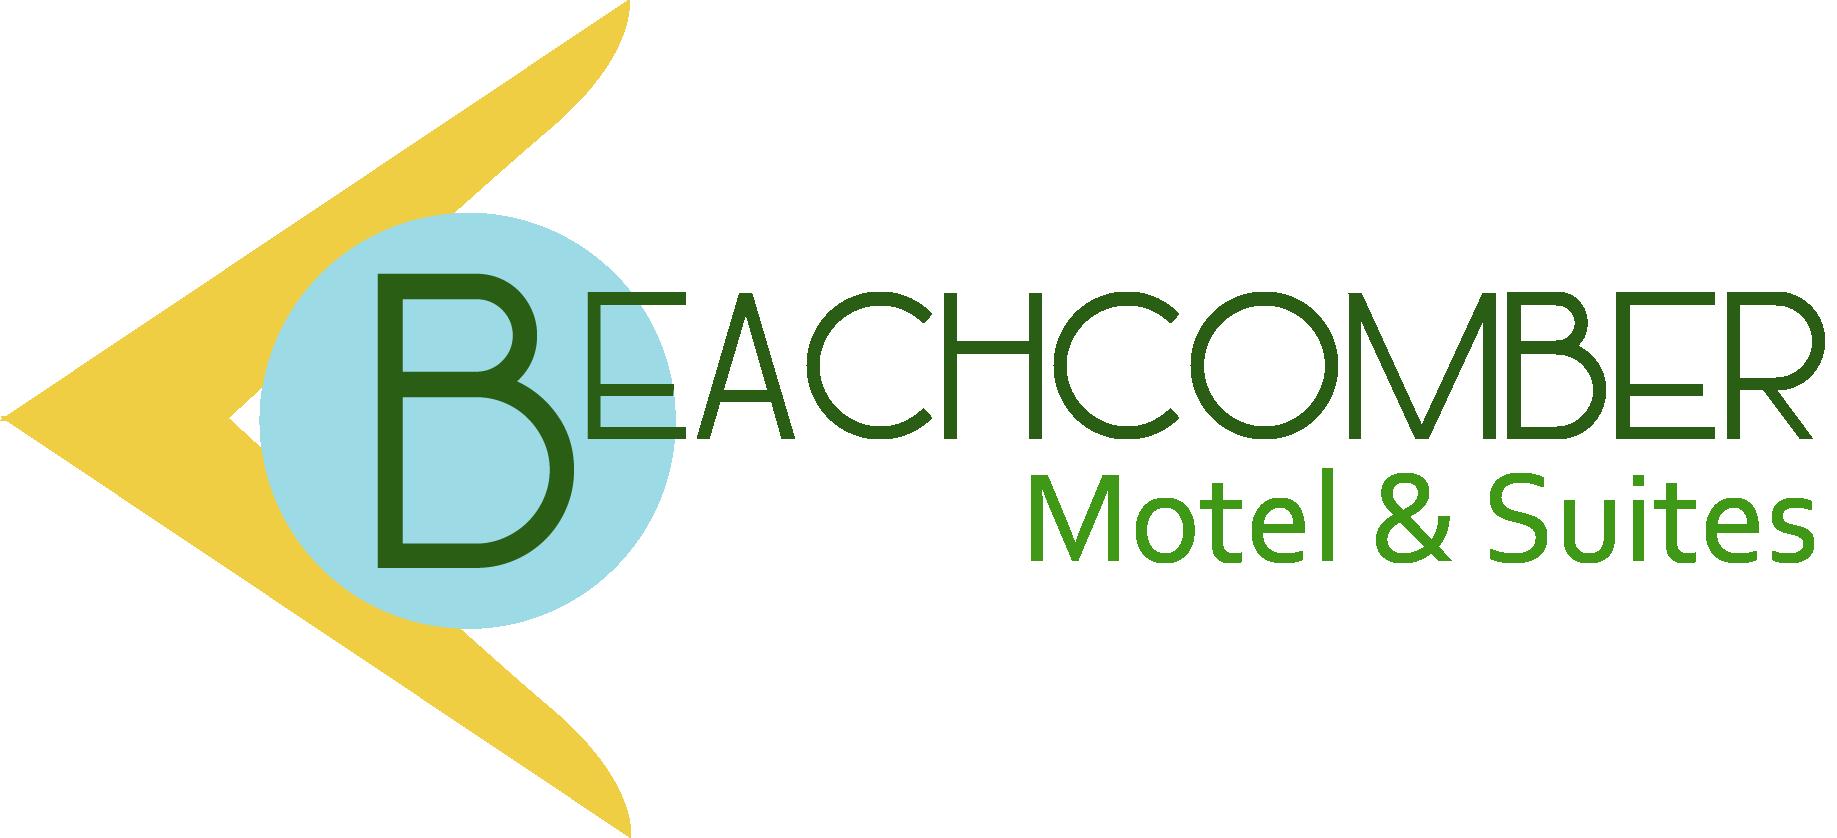 Beachcomber Port Austin Logo